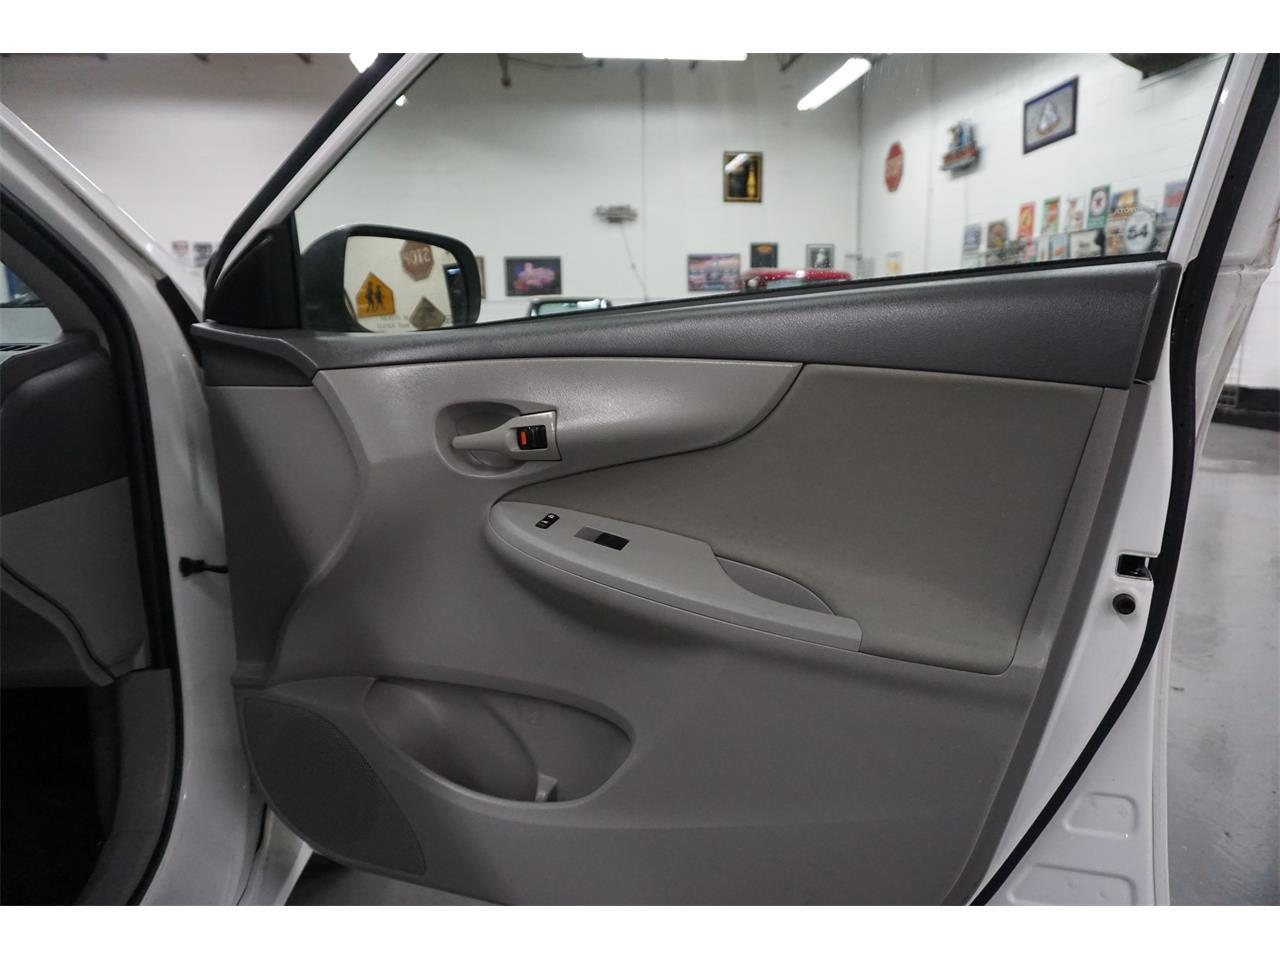 2009 Toyota Corolla (CC-1331608) for sale in Glen Burnie, Maryland